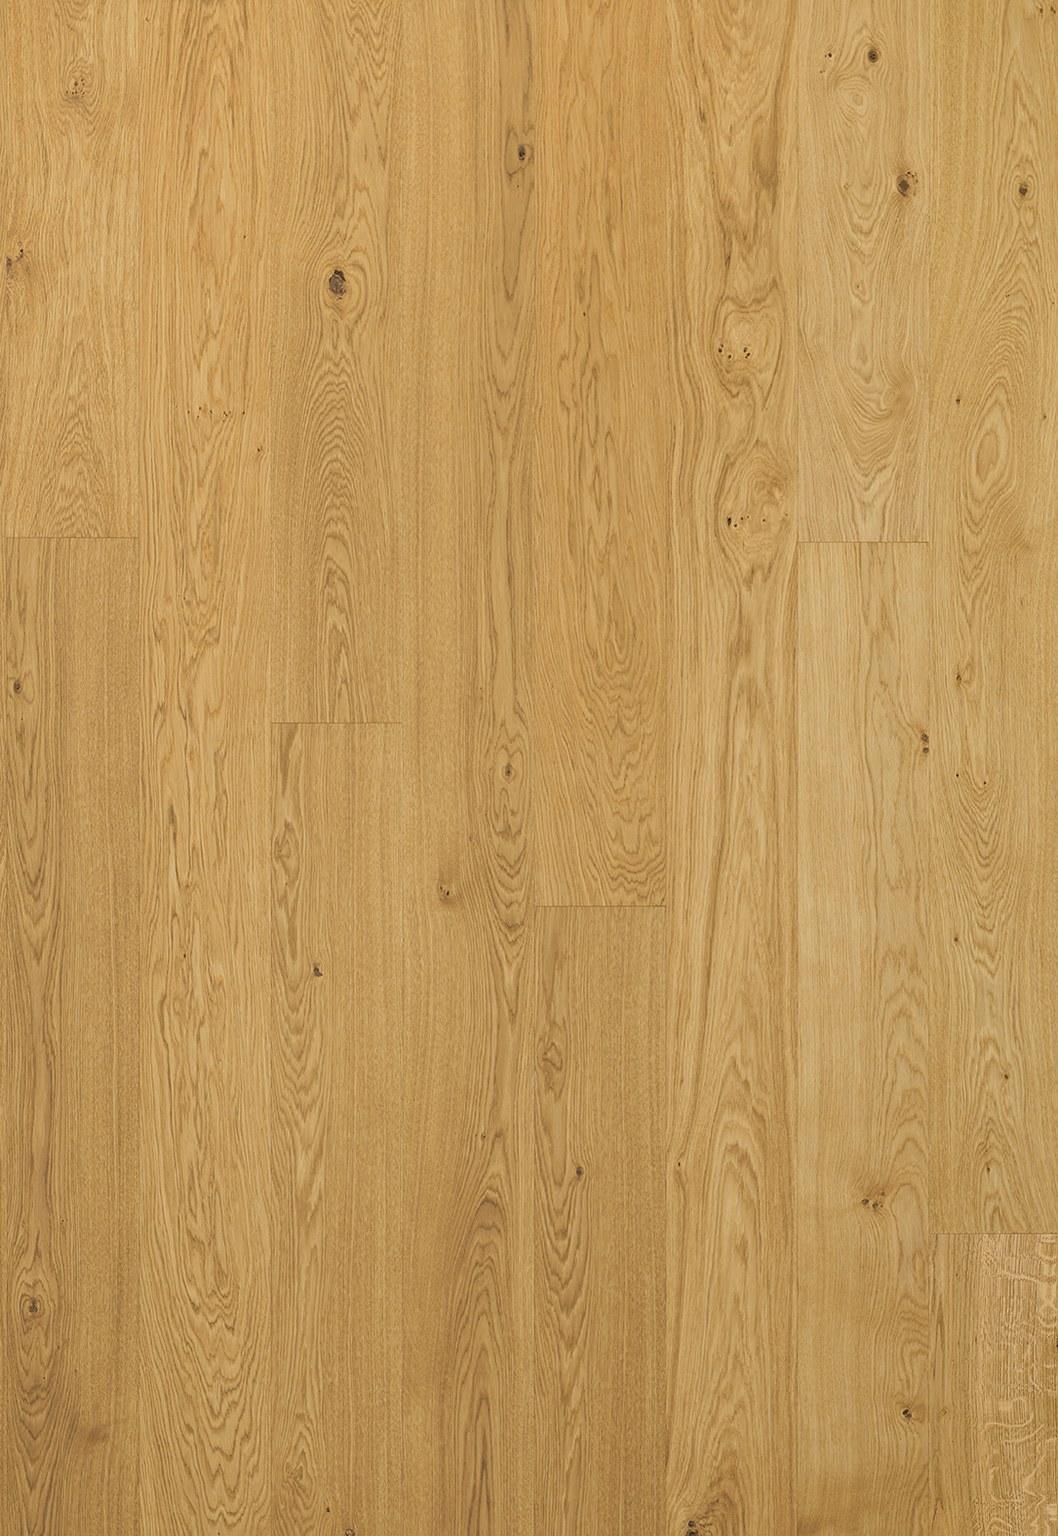 Timberwise Parketti Lankkuparketti Puulattia Wooden Floor Parquet Plank Tammi Oak Classic Öljyvaha Wax Oiled 2D1 (1)